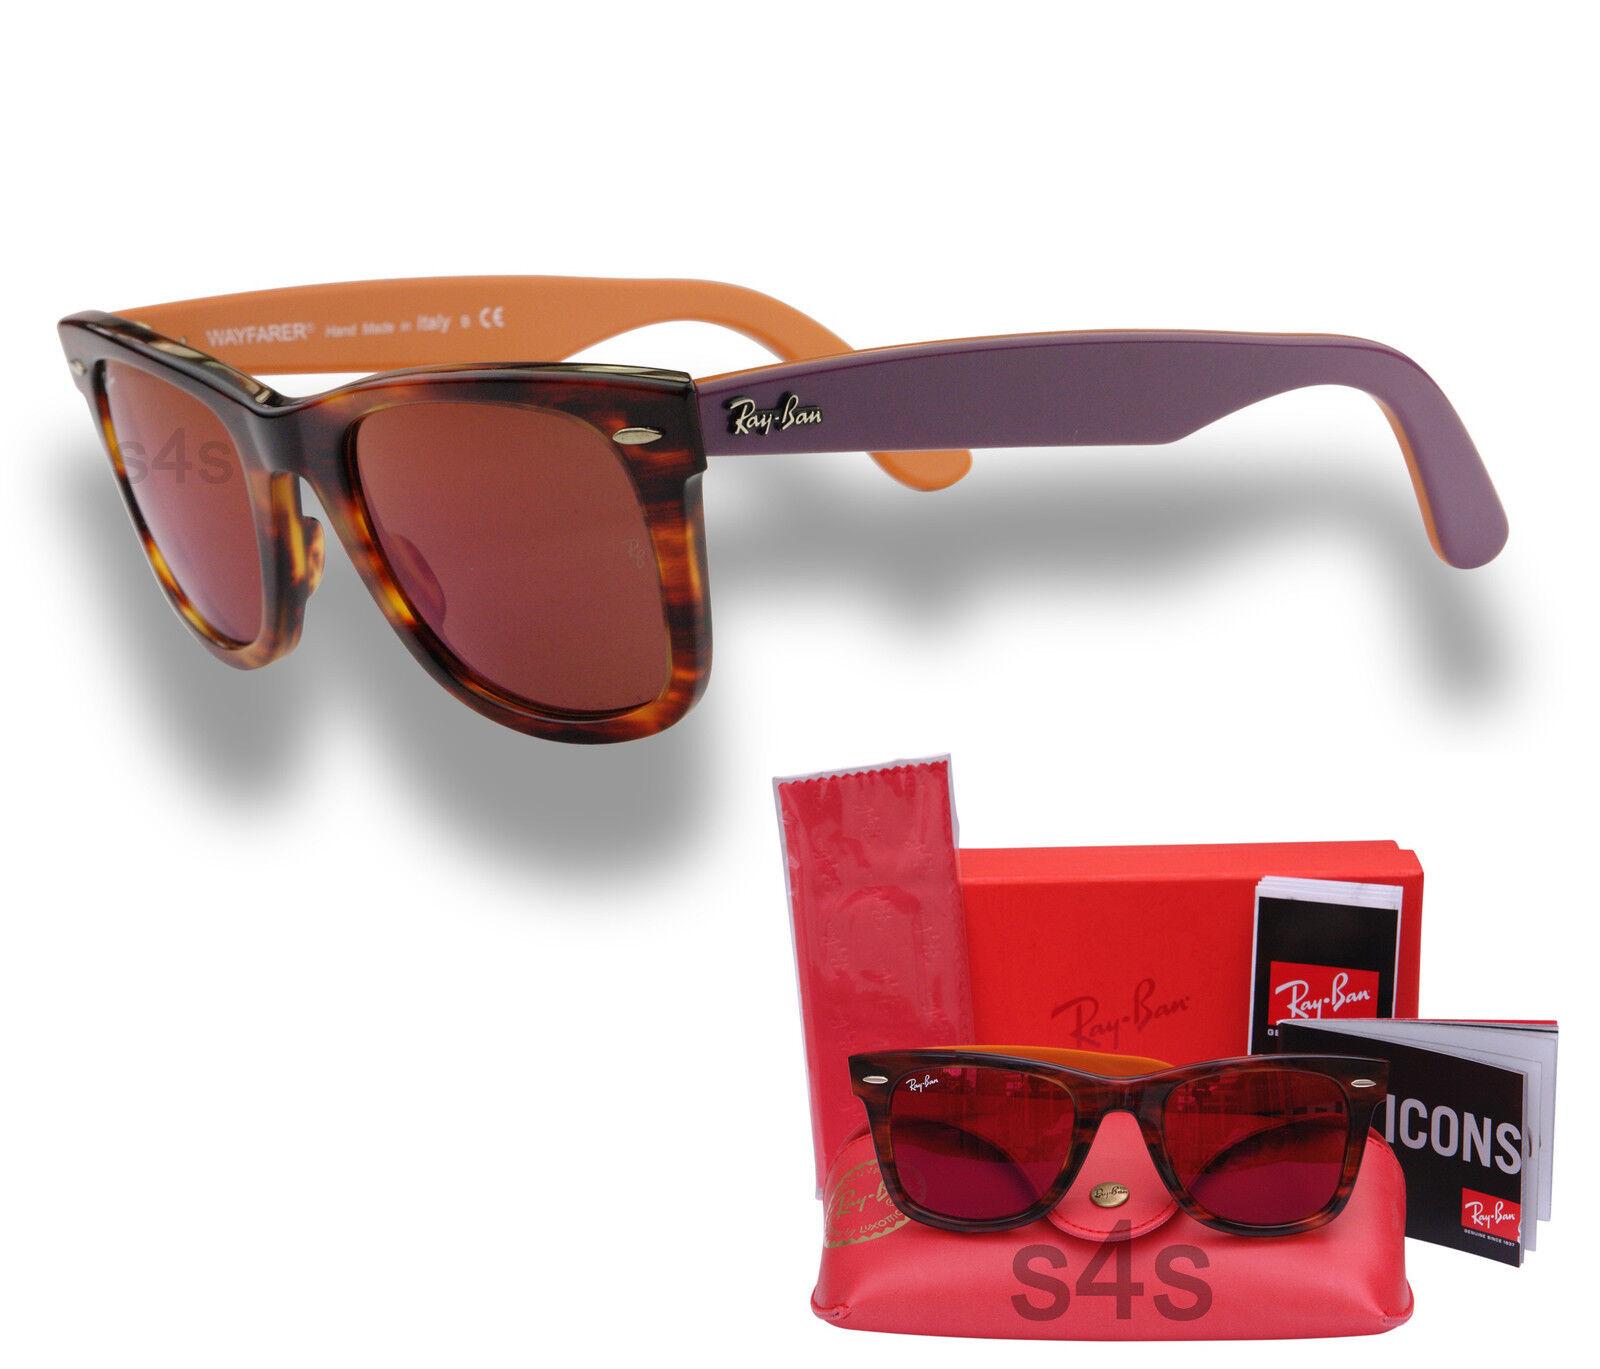 Sunglasses & Fashion Eyewear